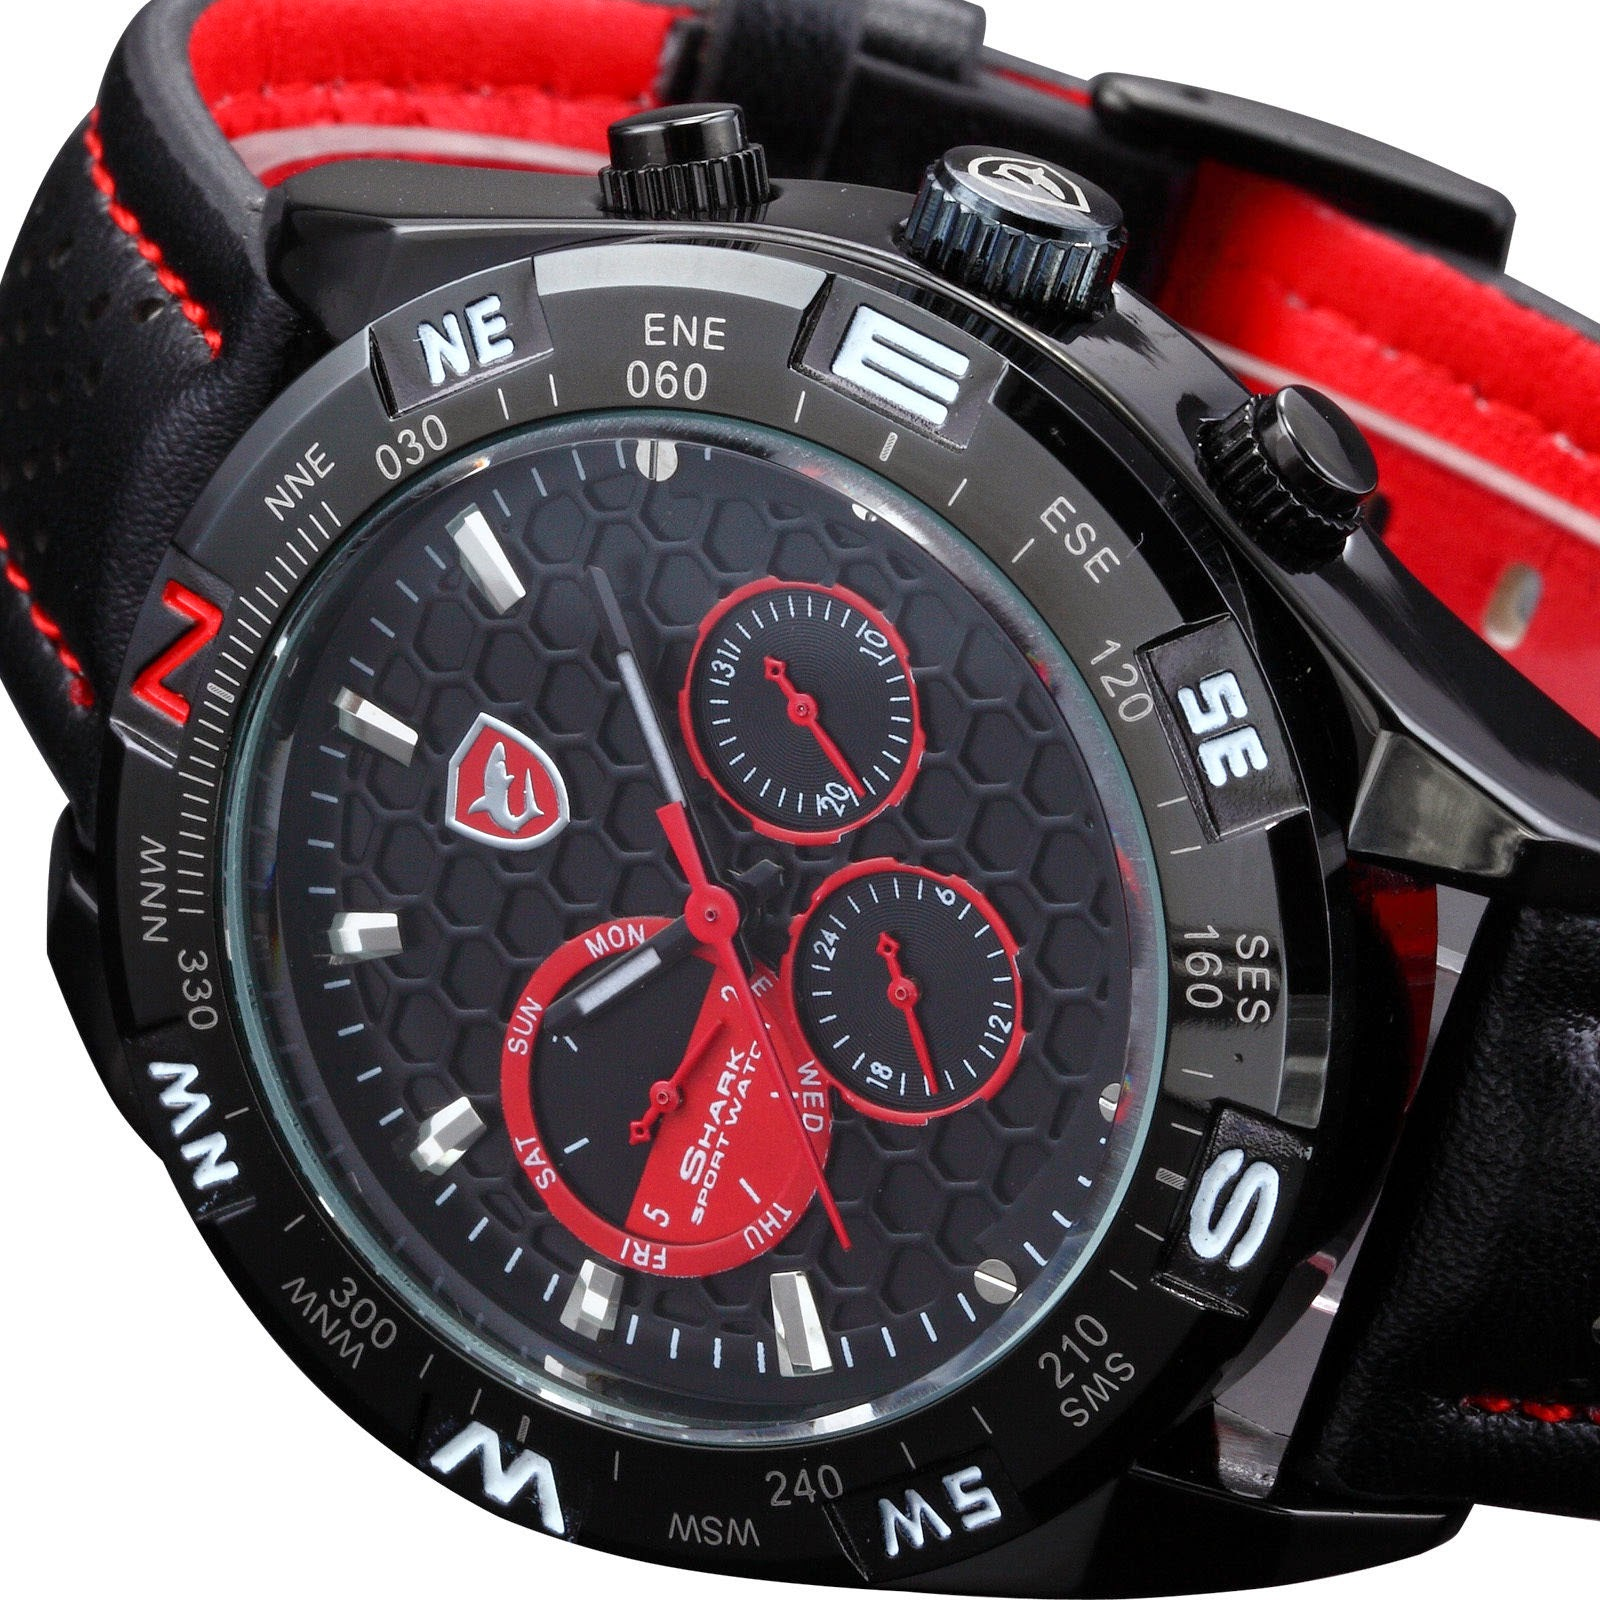 Shark Luxury Men Military Date Day Black Leather Sport Quartz Wrist Watch